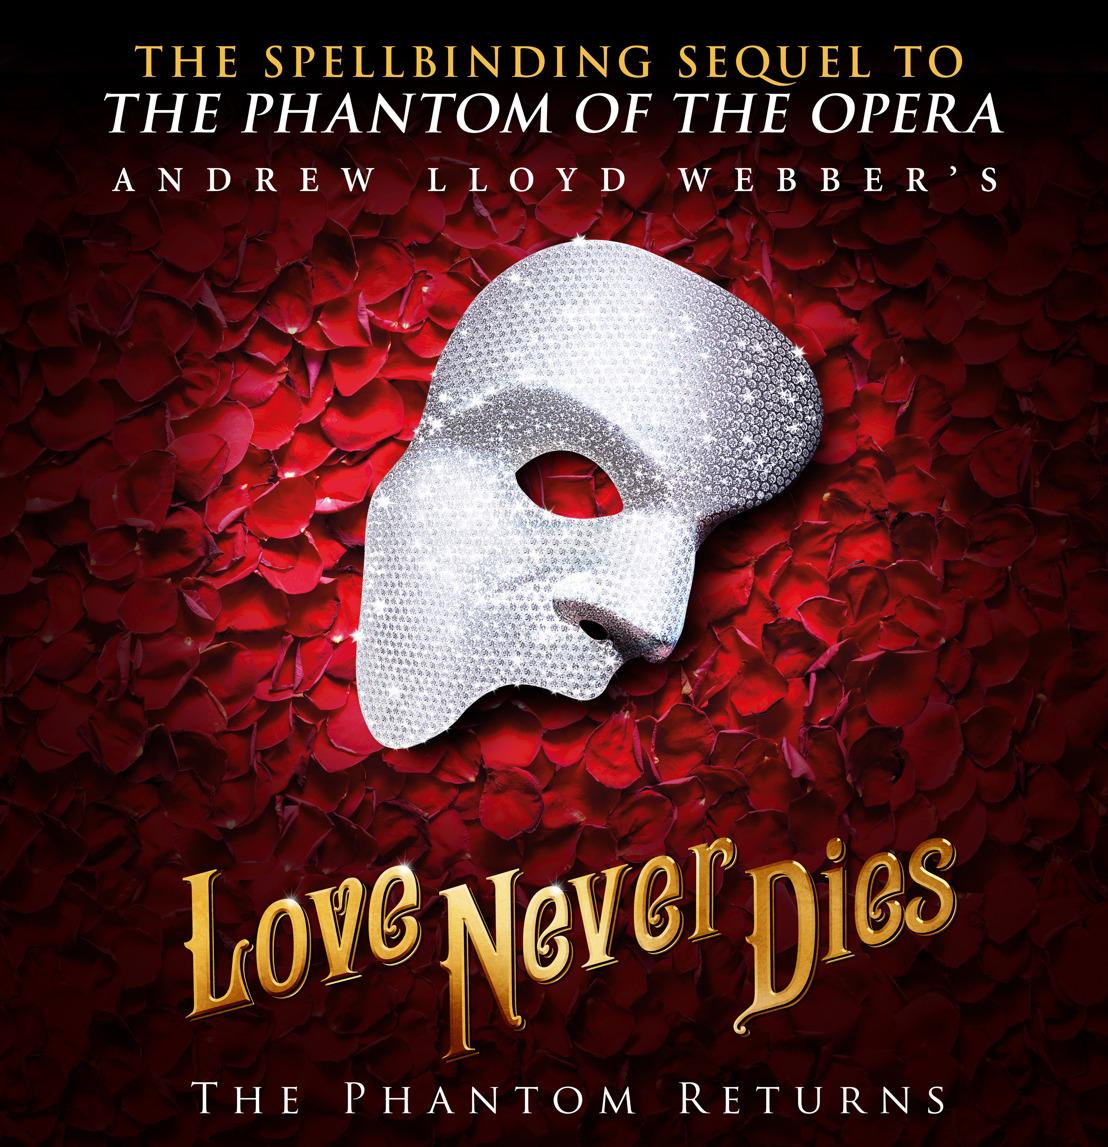 Andrew Lloyd Webber's Love Never Dies Will Play Atlanta's Fox Theatre November 28 - December 3